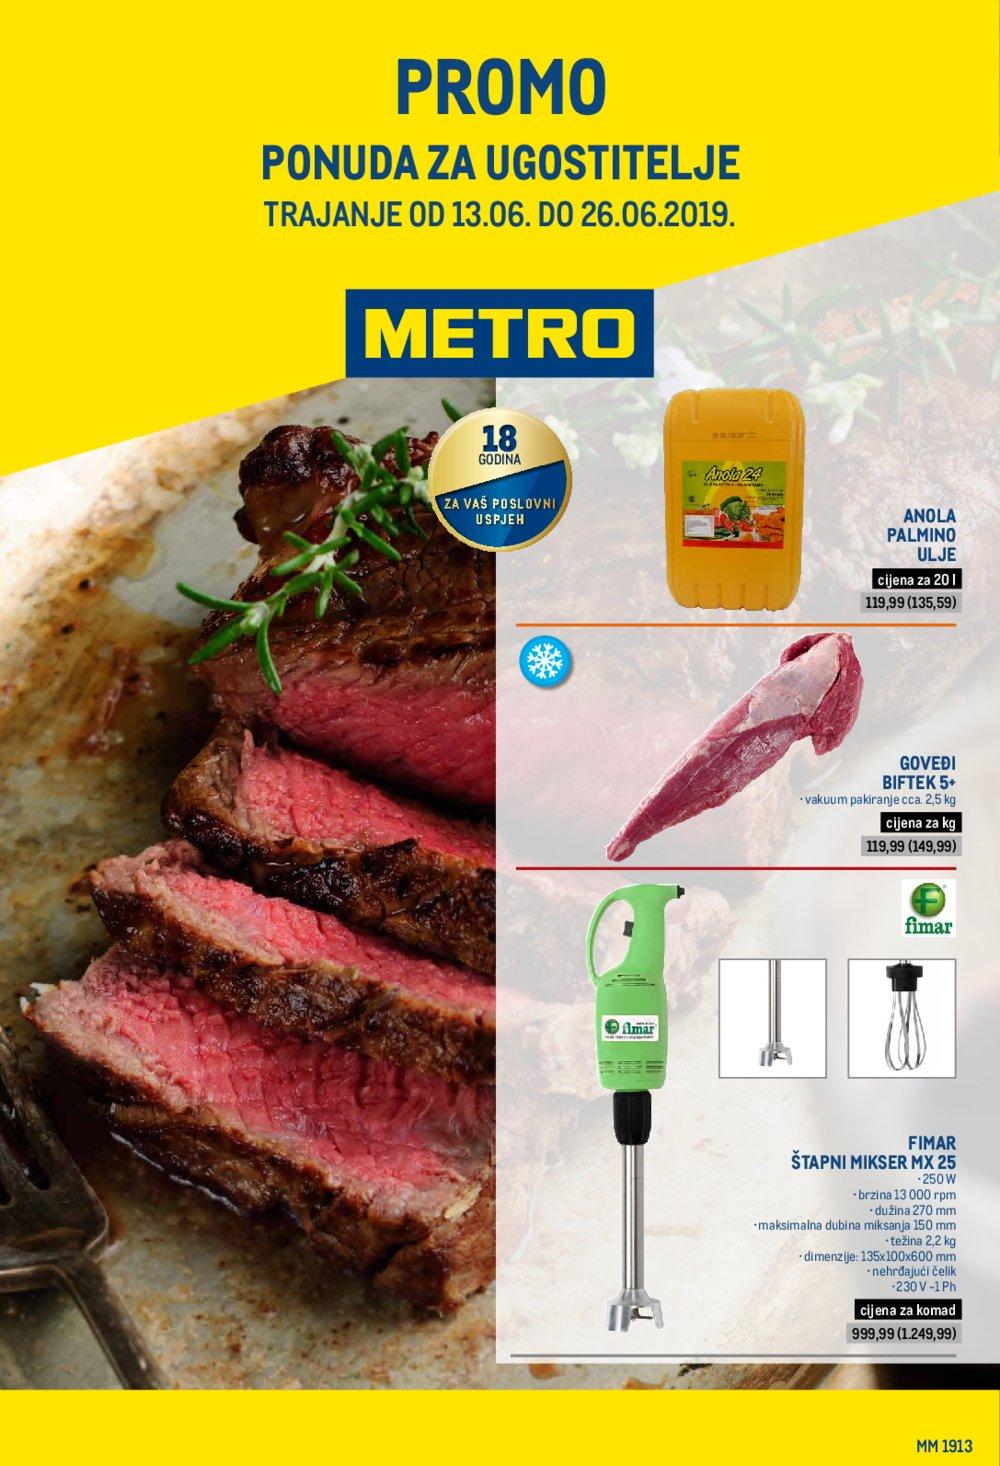 Metro katalog promo ponuda za ugostitelje 13.06.-26.06.2019.